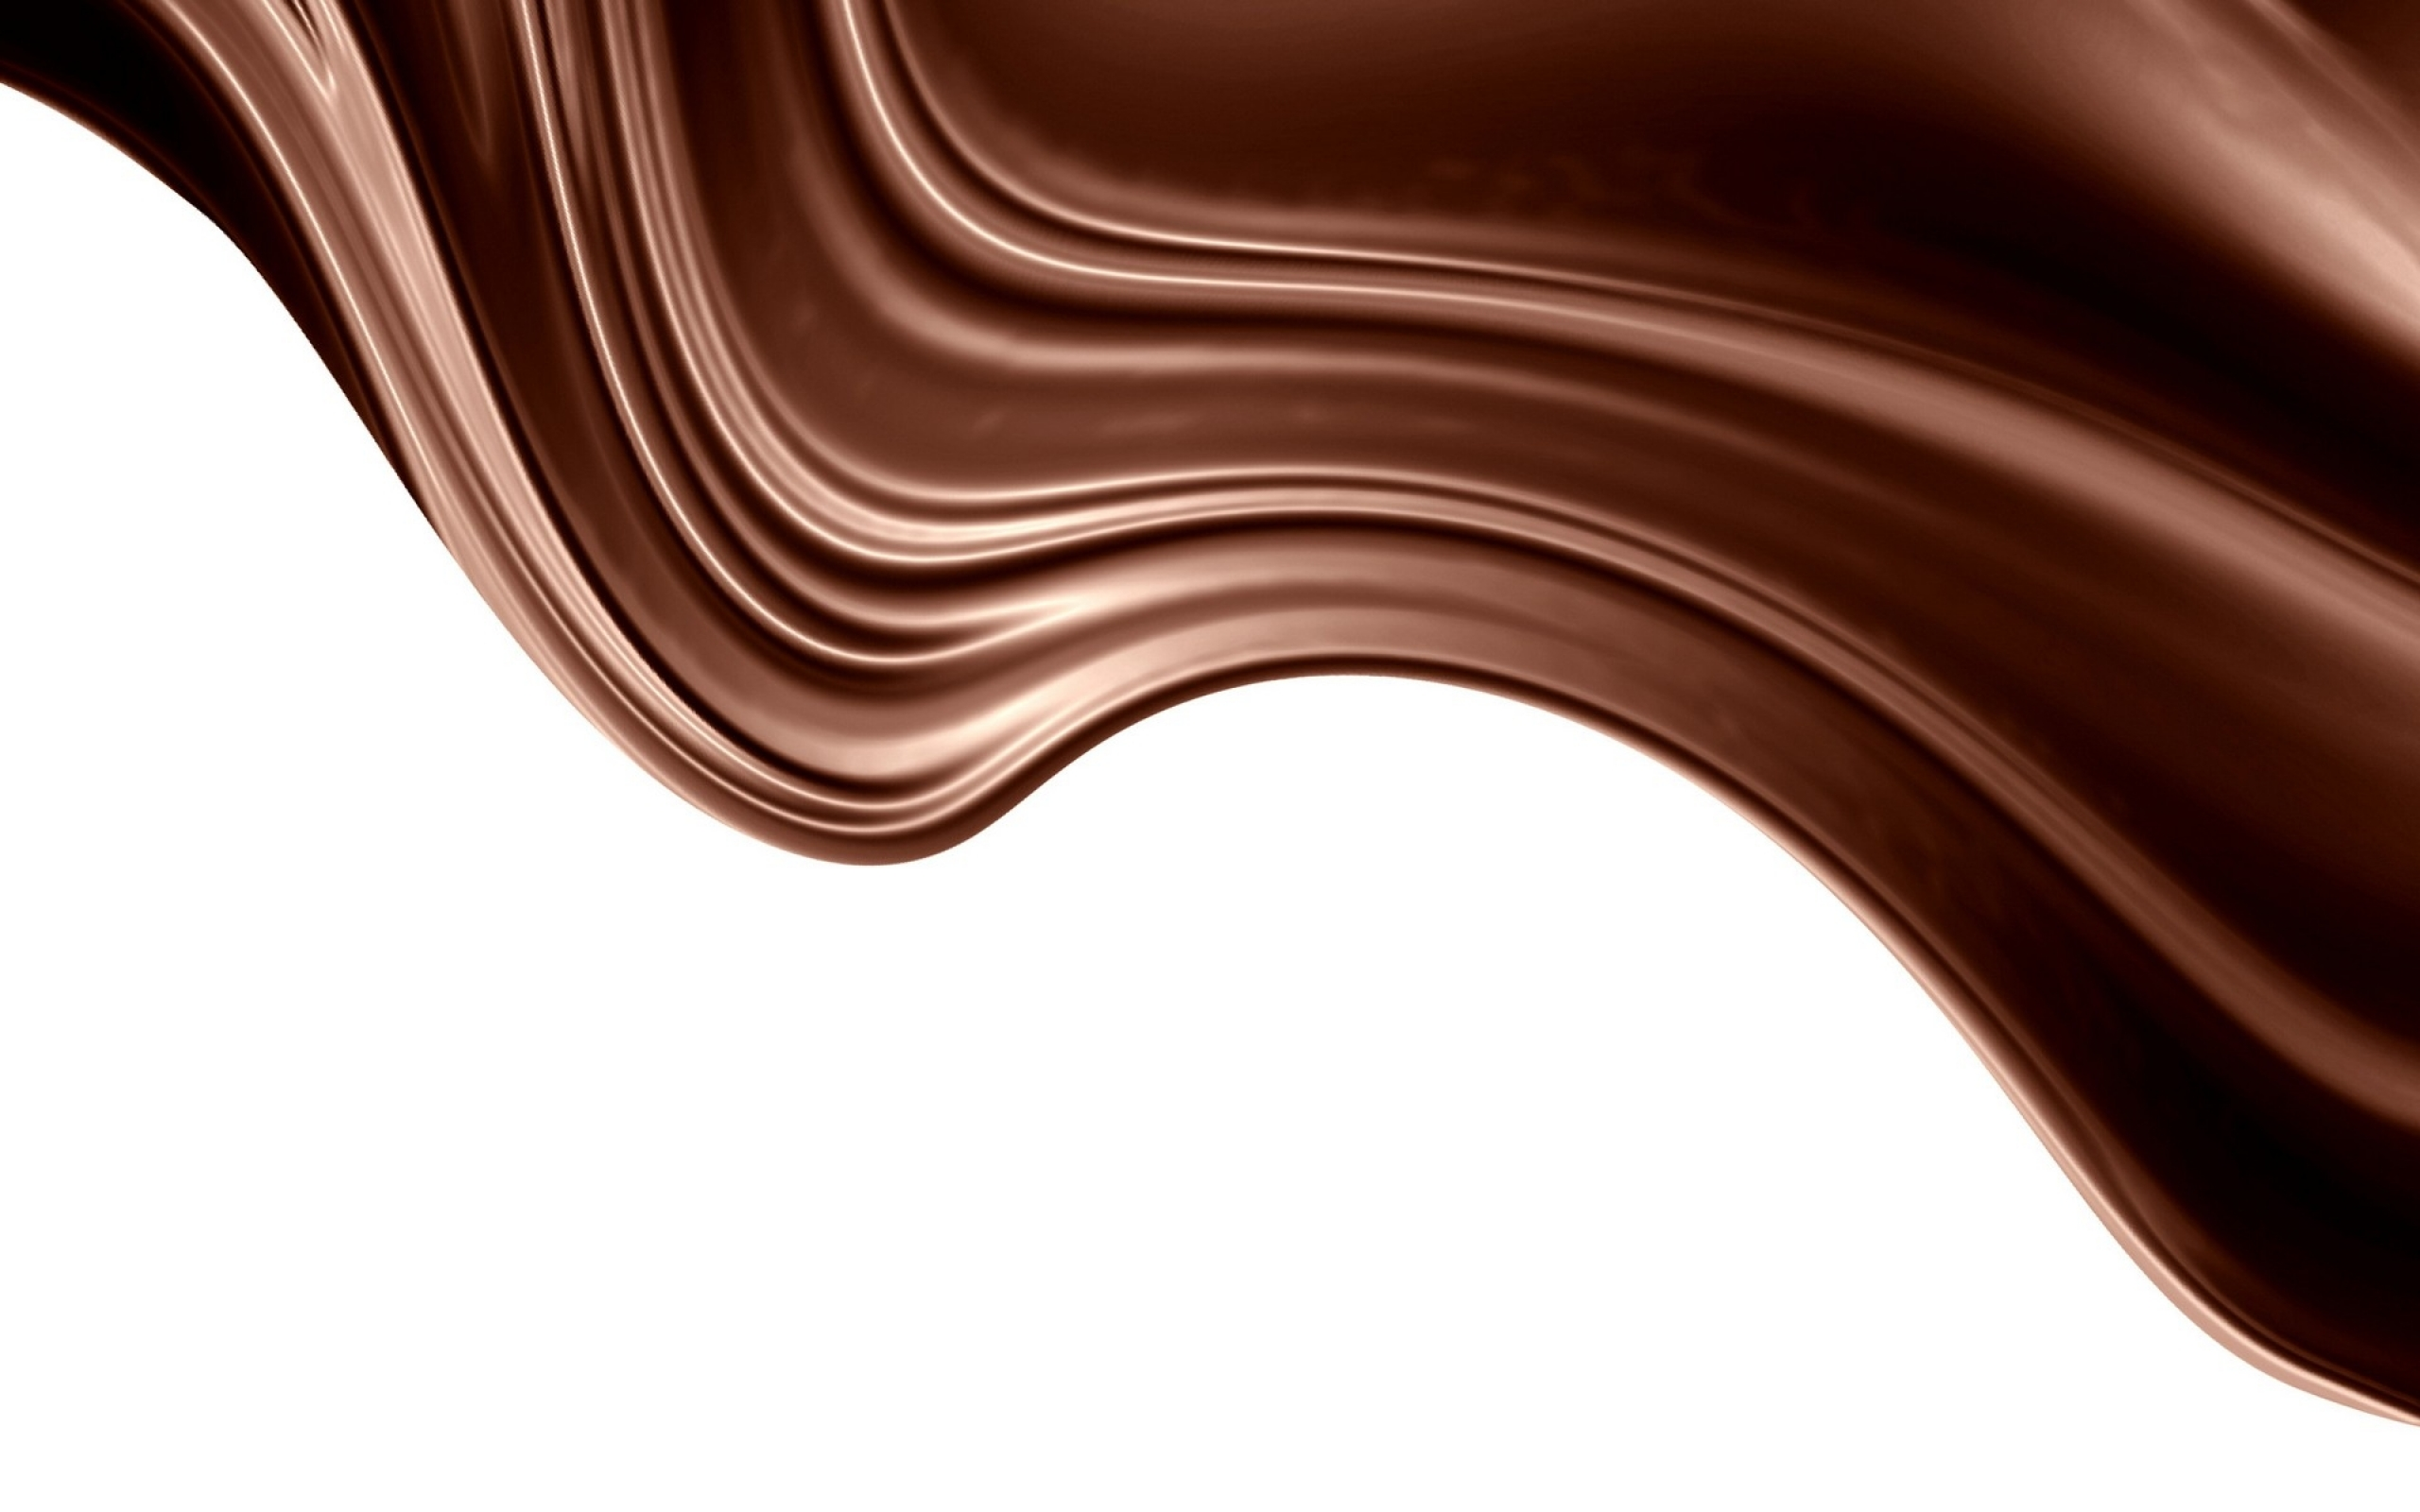 chocolate 1920x1200 wallpaper Wallpaper Wallpapers Download 2560x1600